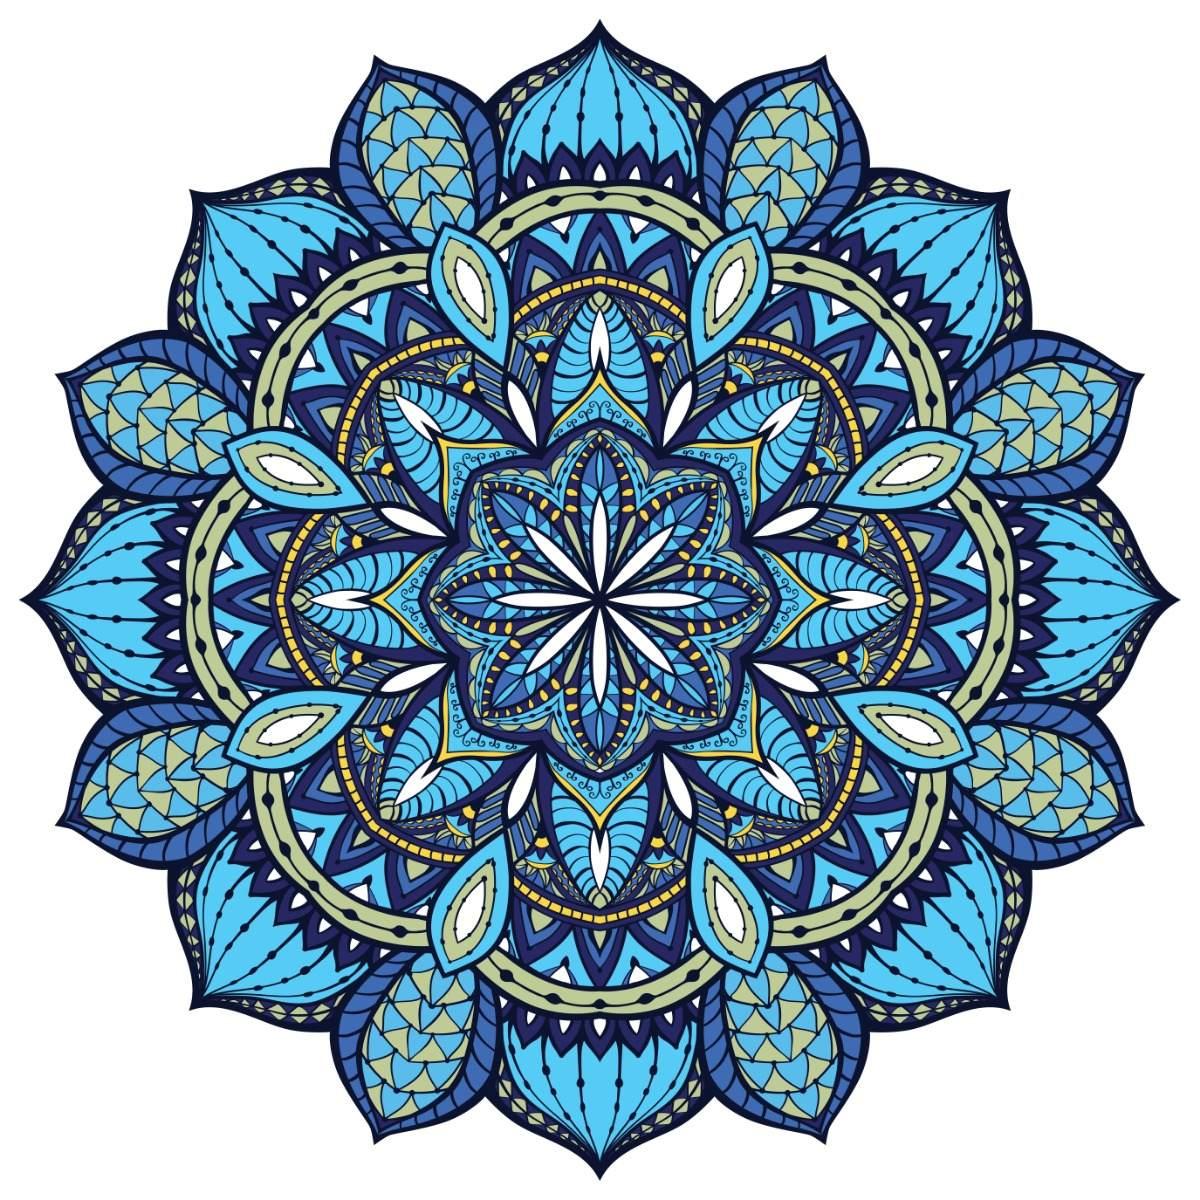 MANDALAS PINTADOS 1 Mandala-azul-y-verde-cuadro-decorativo-en-canvas-D_NQ_NP_702201-MLM28387479348_102018-F